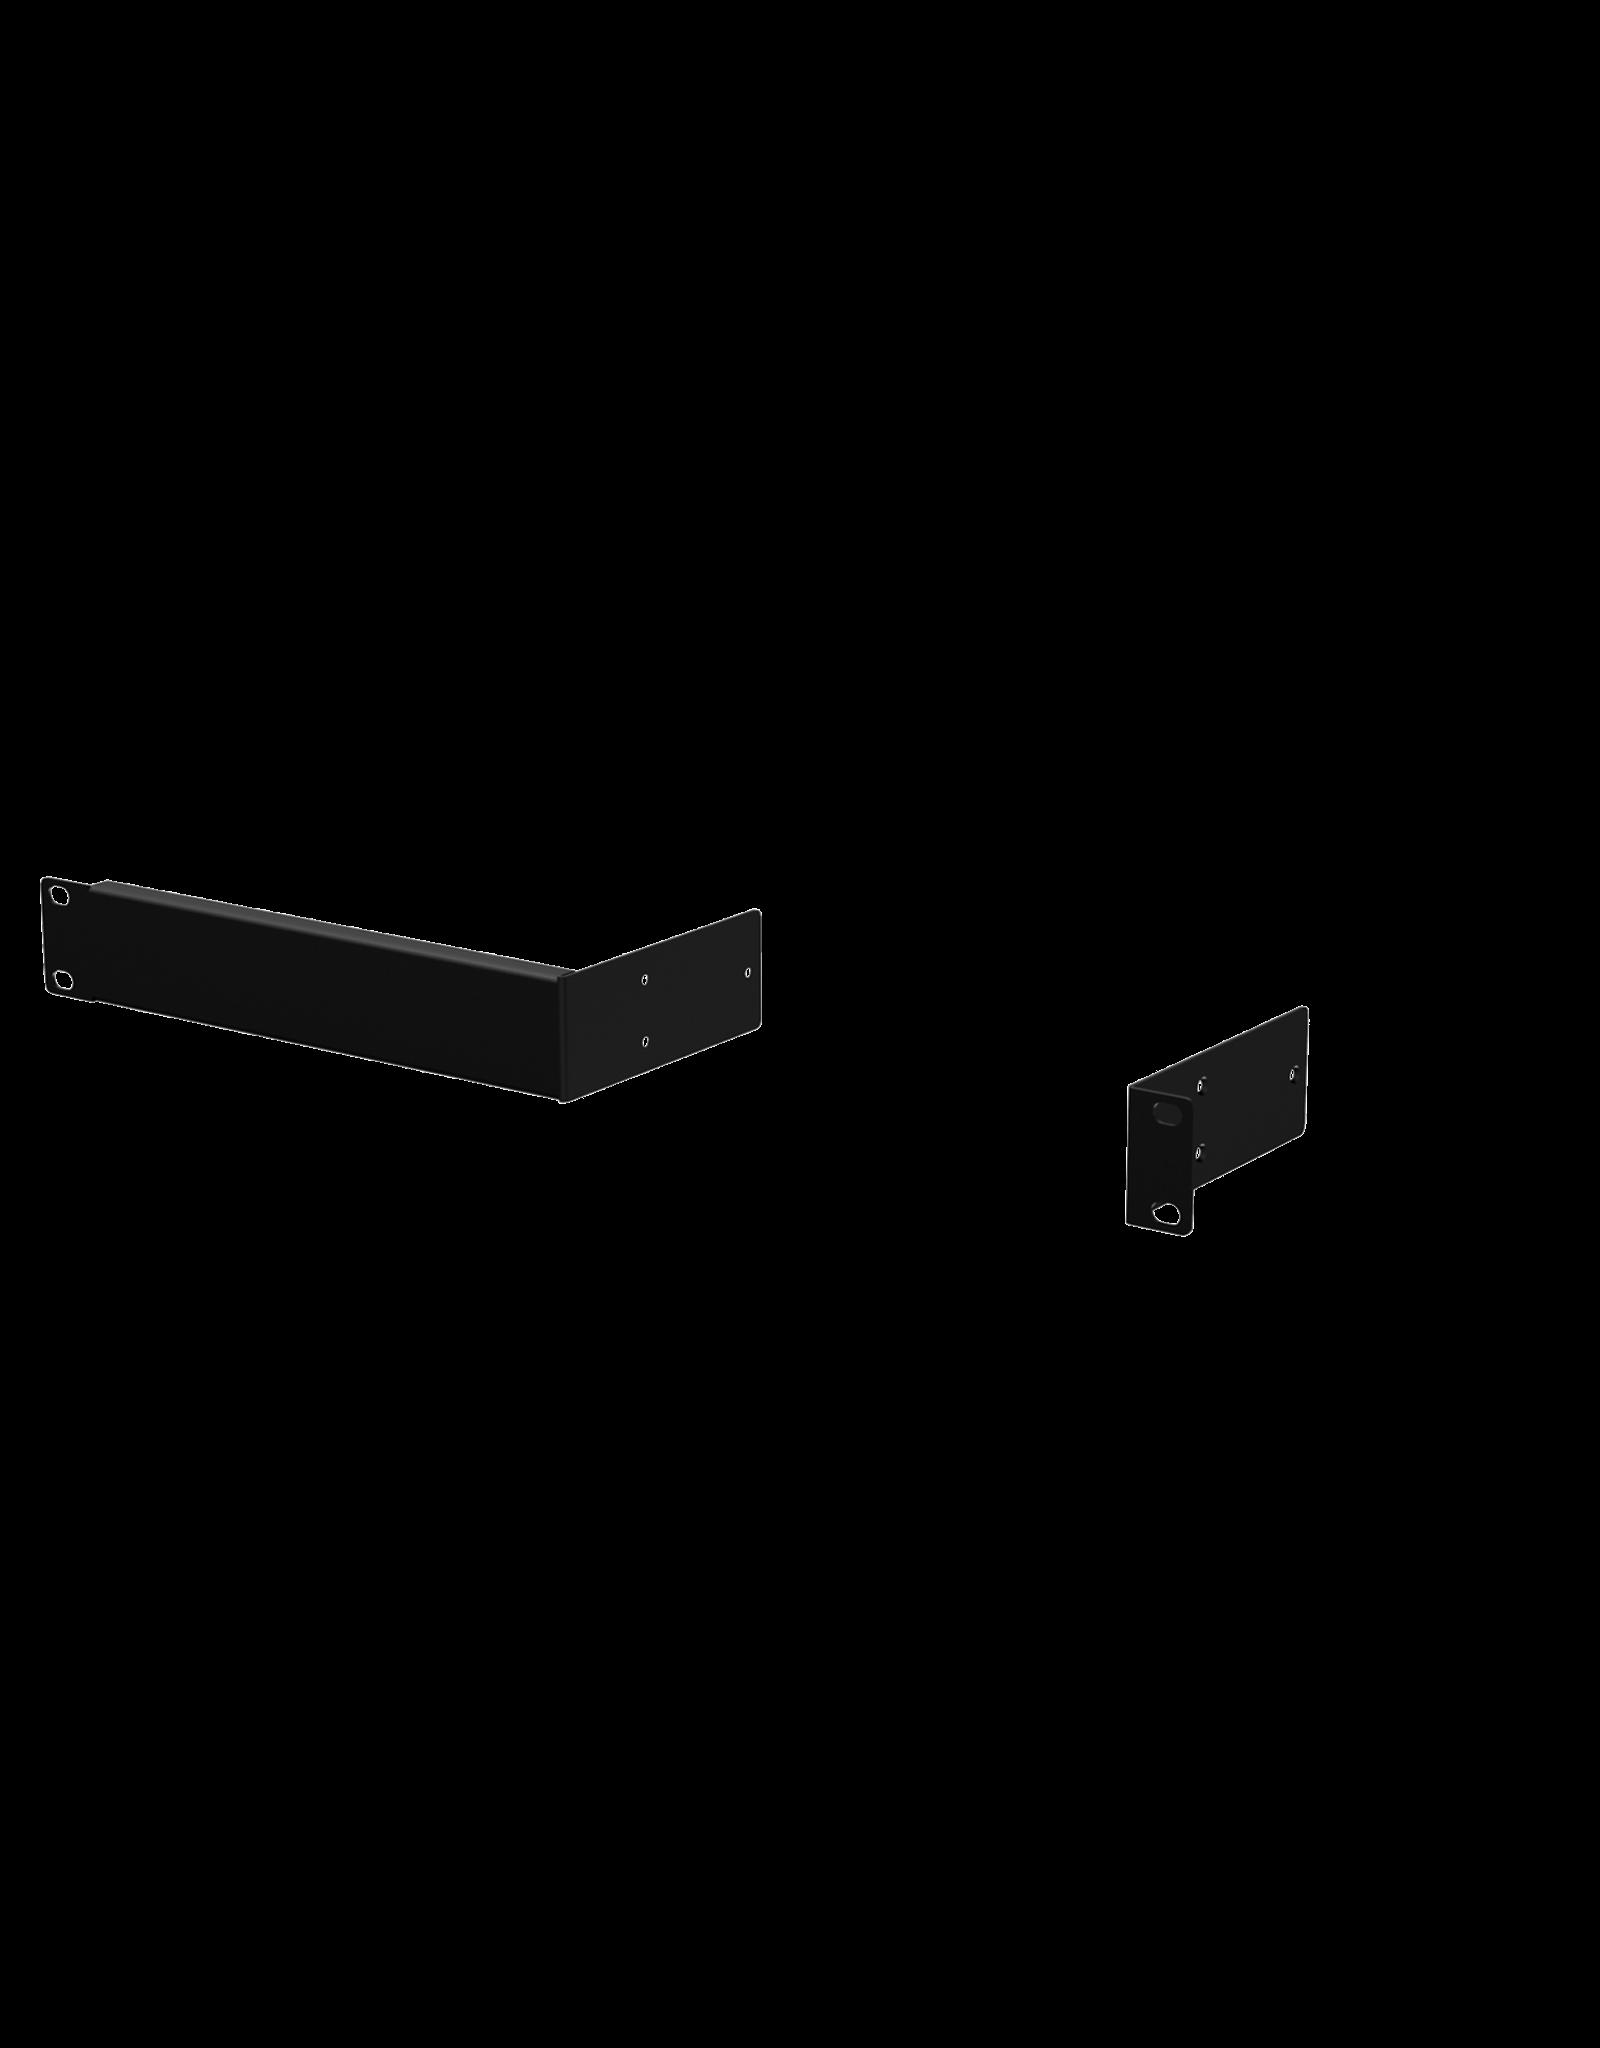 Audac Rack mounting set for half rackspace 1u enclosures